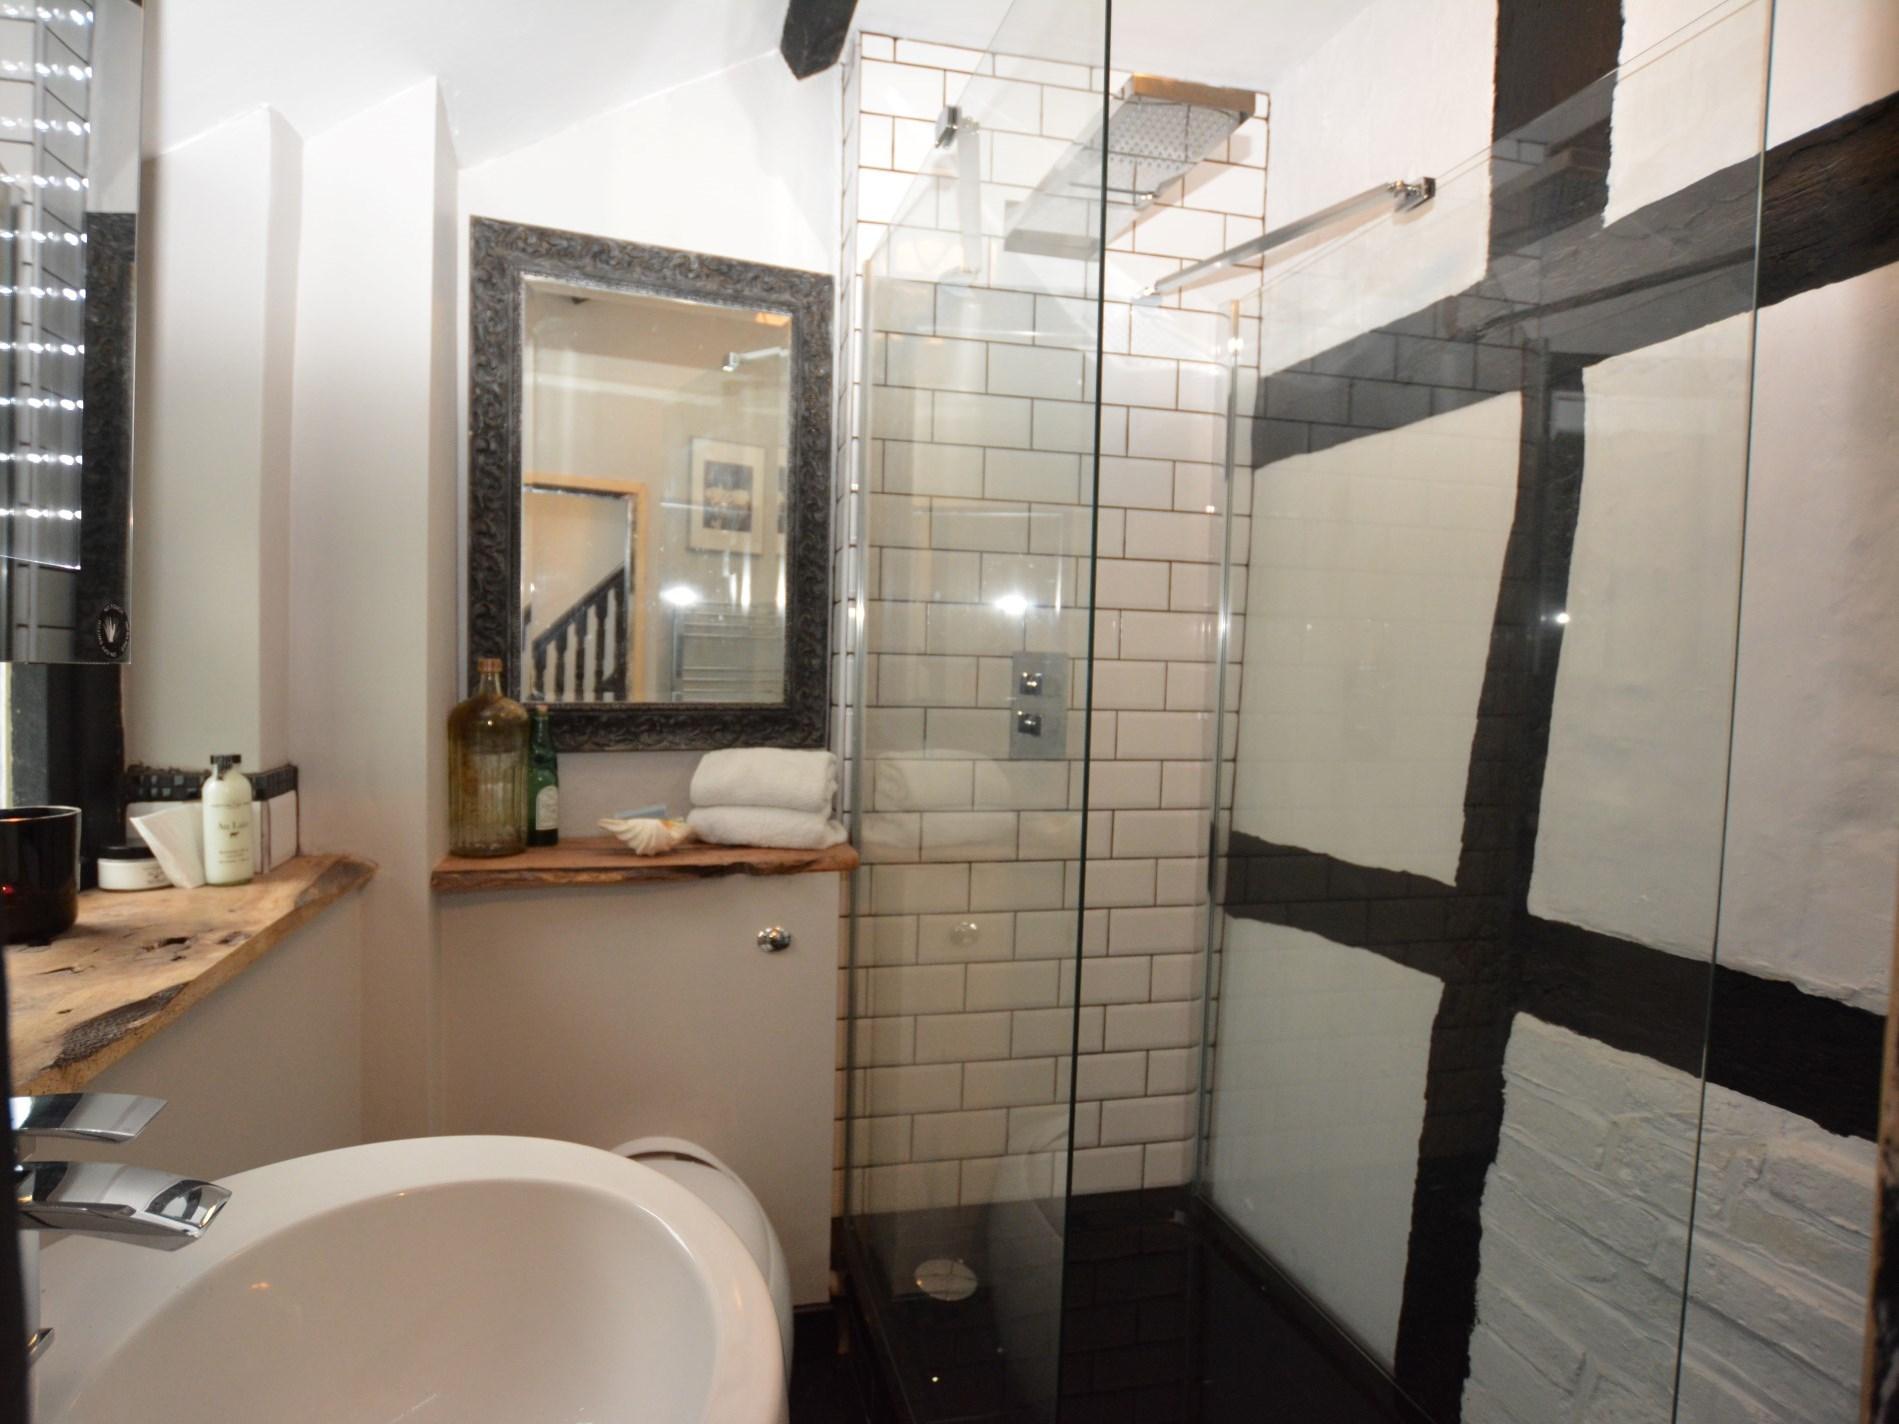 1 Bedroom Cottage in Ludlow, Heart of England